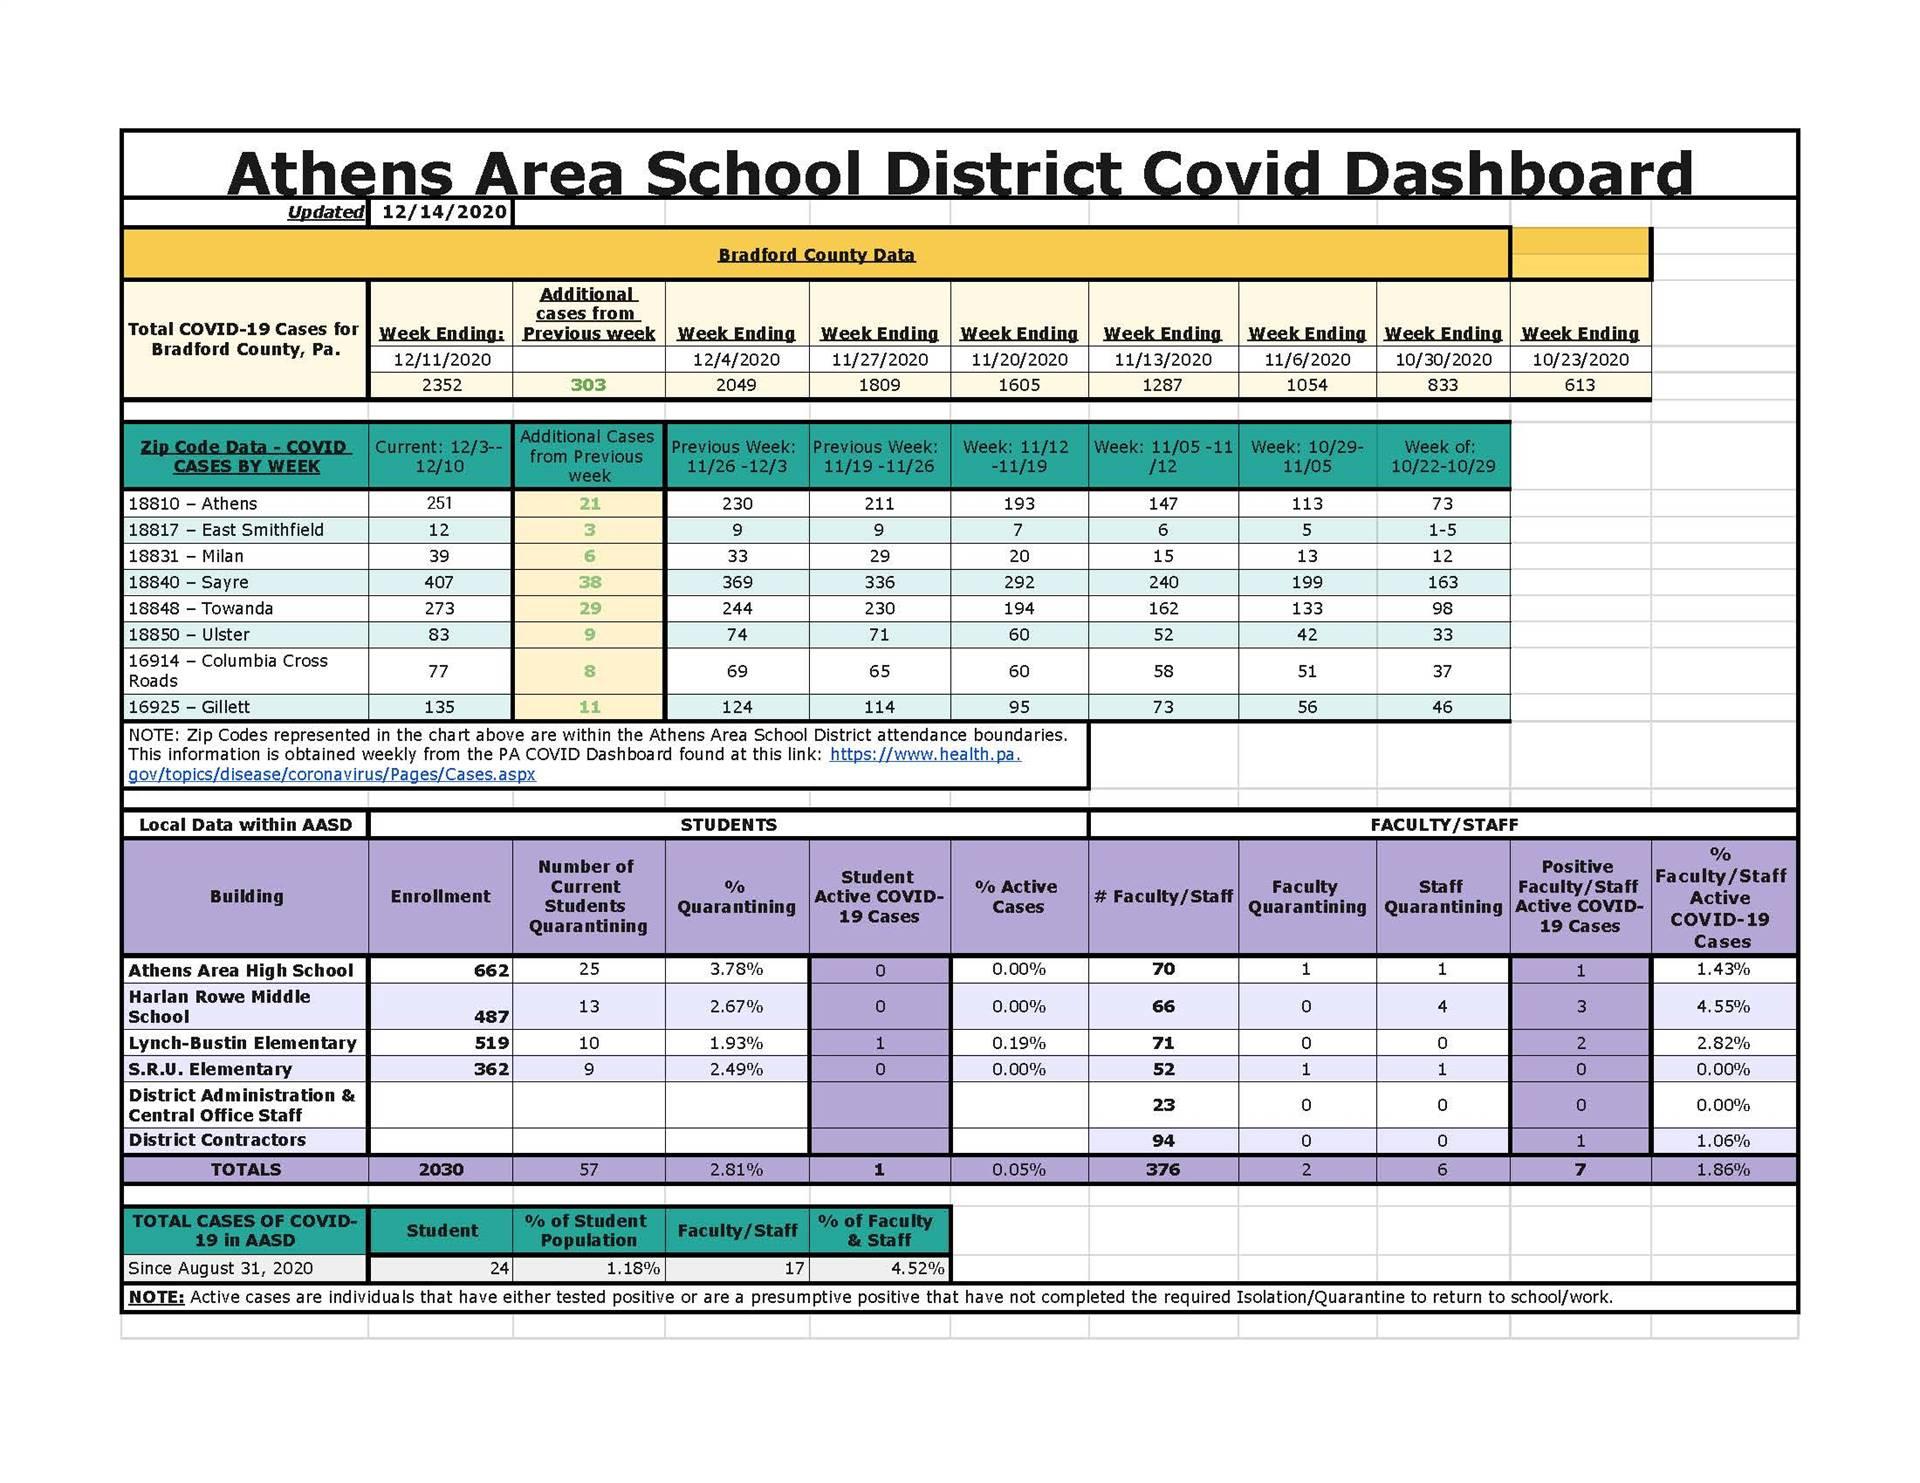 AASD COVID Dashboard 12.14.2020